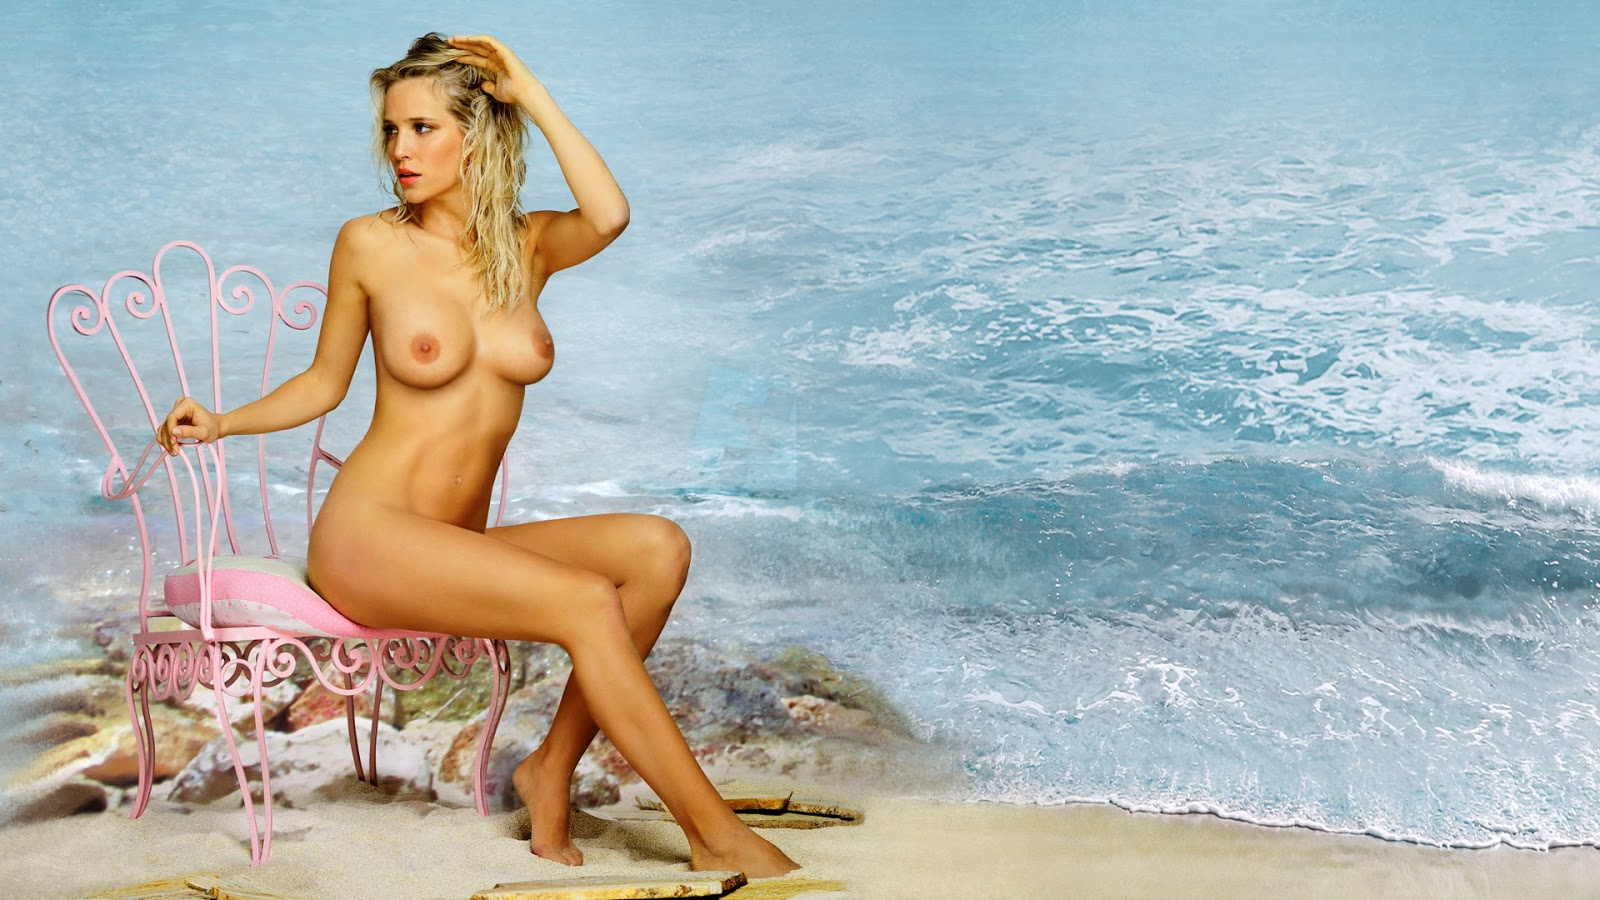 Ana Margade Porno fakes de ana morgade sexy erotic girls nude picture | bluedols